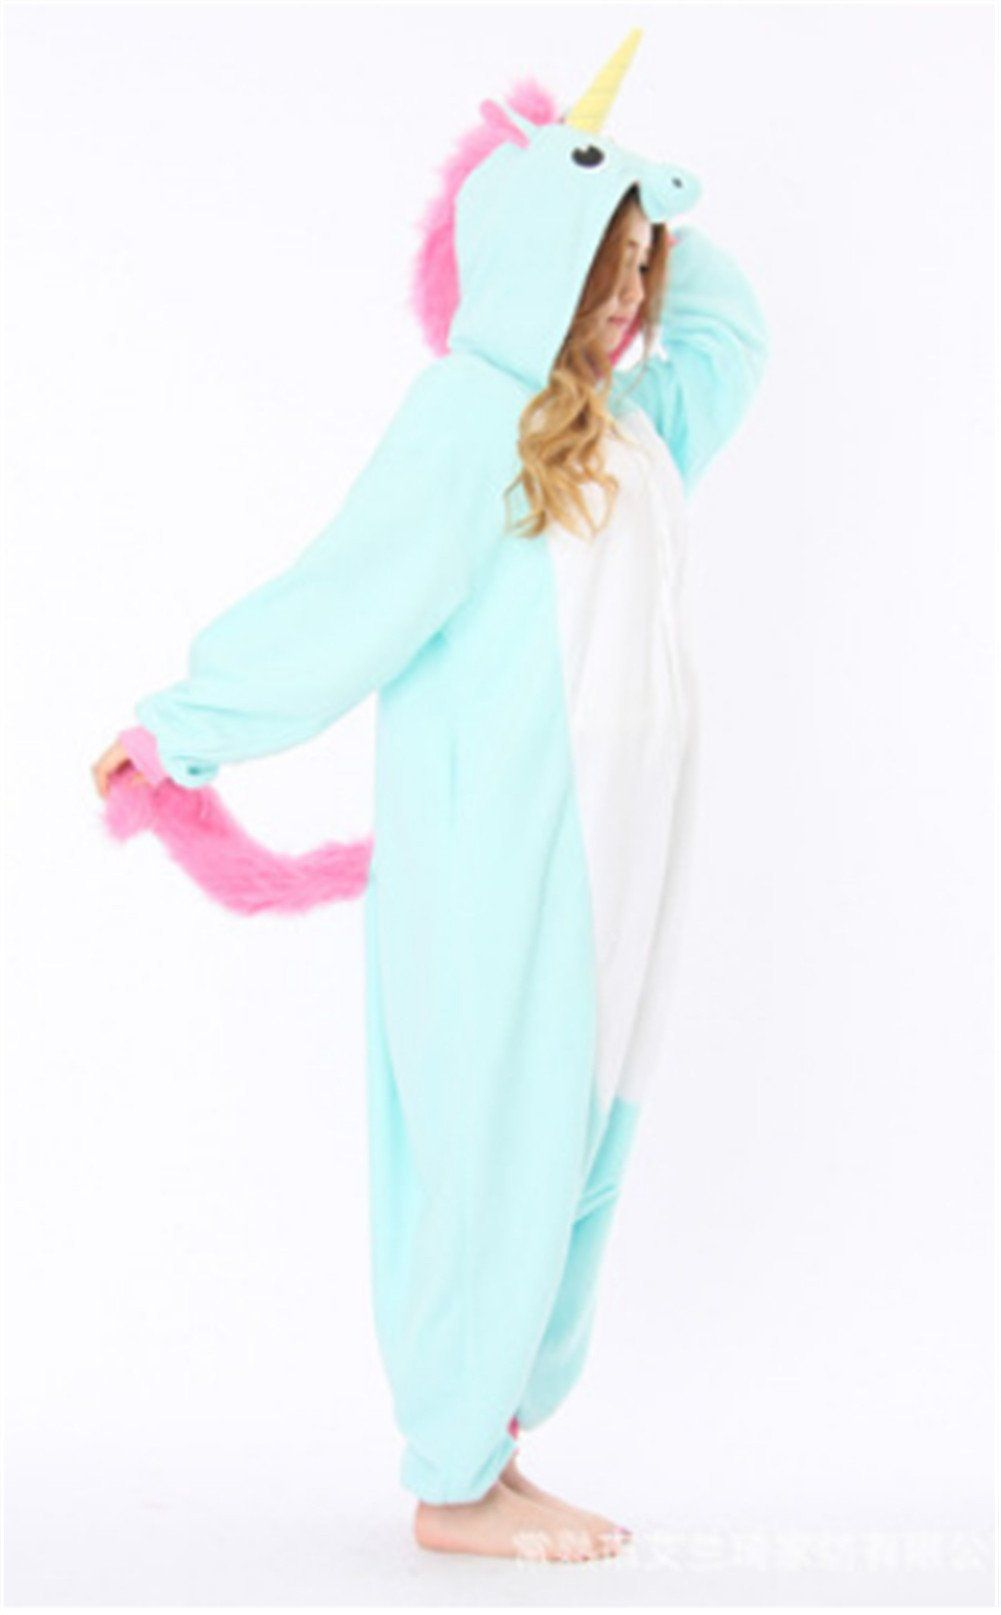 Yarbar Adultes Kigurumi Animaux Pyjamas Costume Anime Cosplay